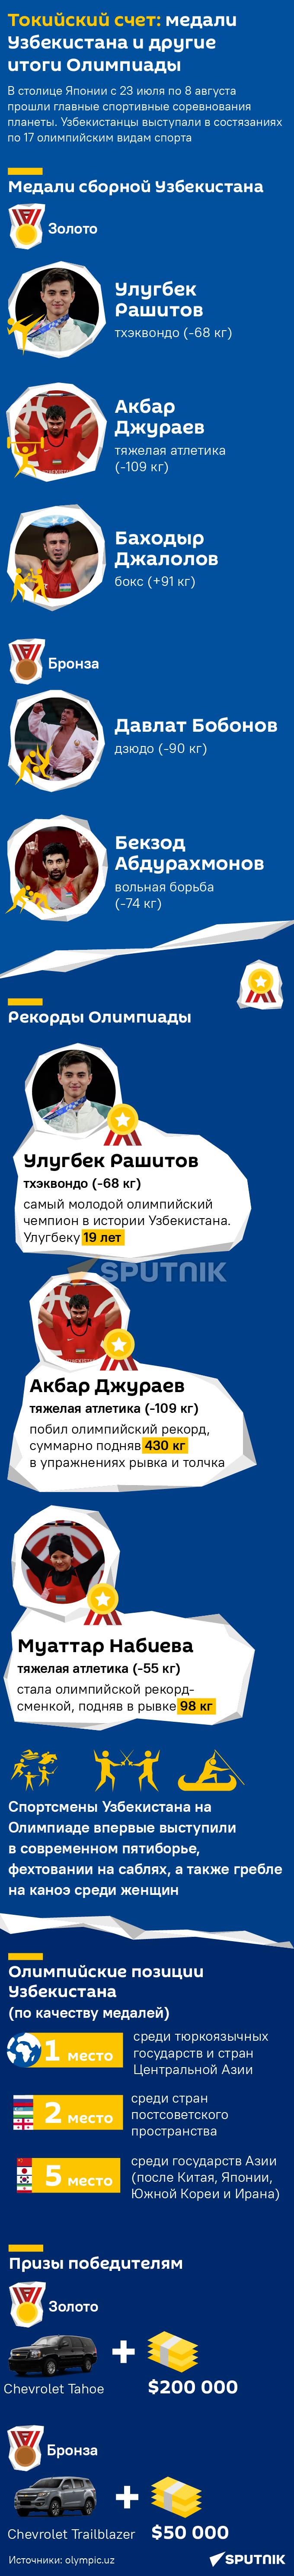 Узбекистан на Олимпиаде 2020 мобилка - Sputnik Узбекистан